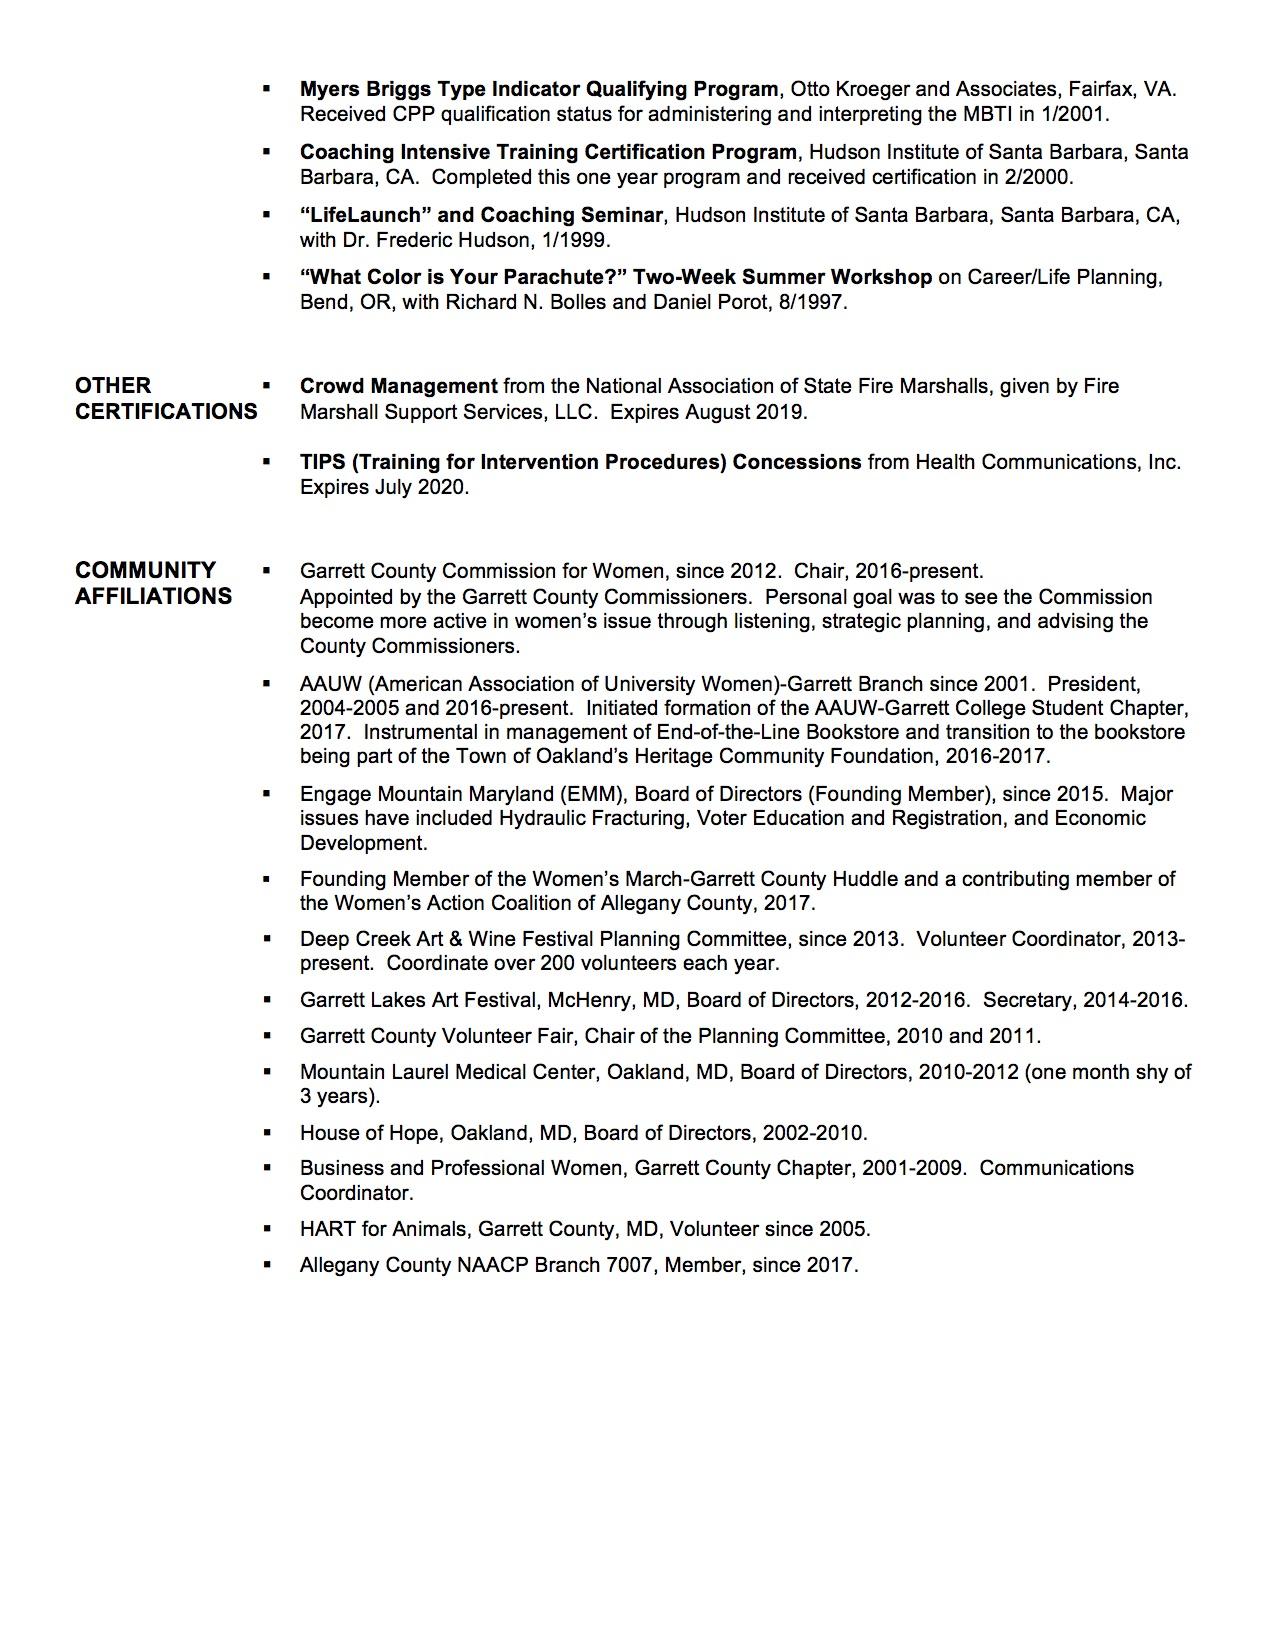 Candidate Resume 3.jpg